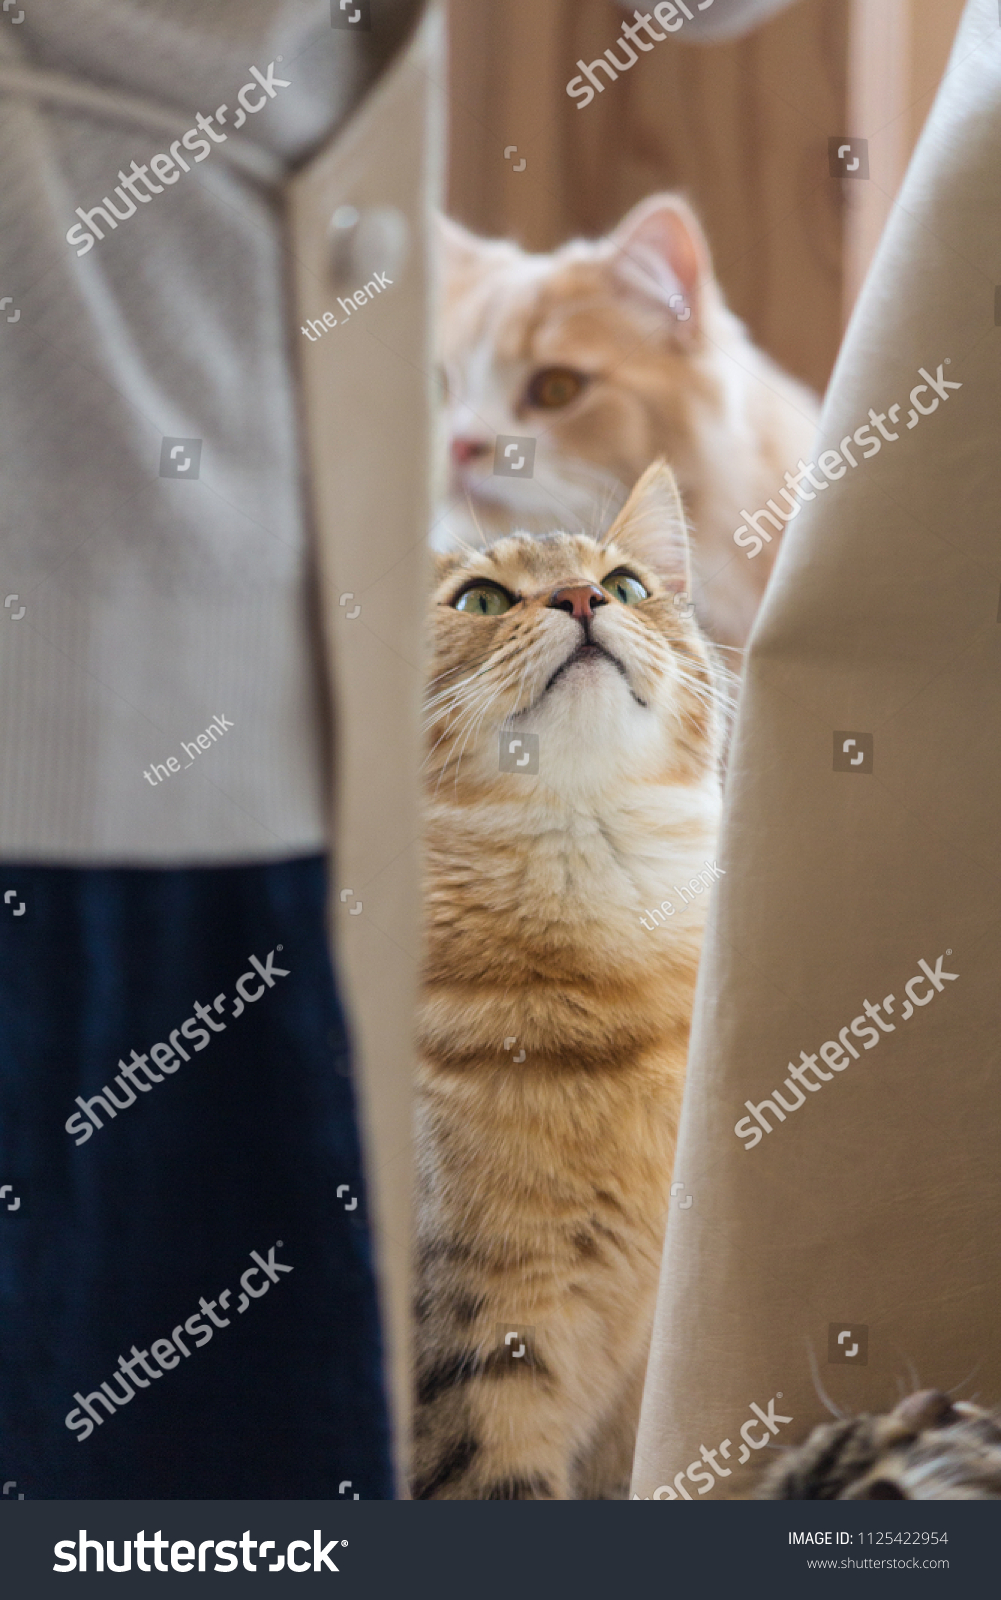 Cat Awaiting Be Feeded Mocha Cat Stock Photo Edit Now 1125422954